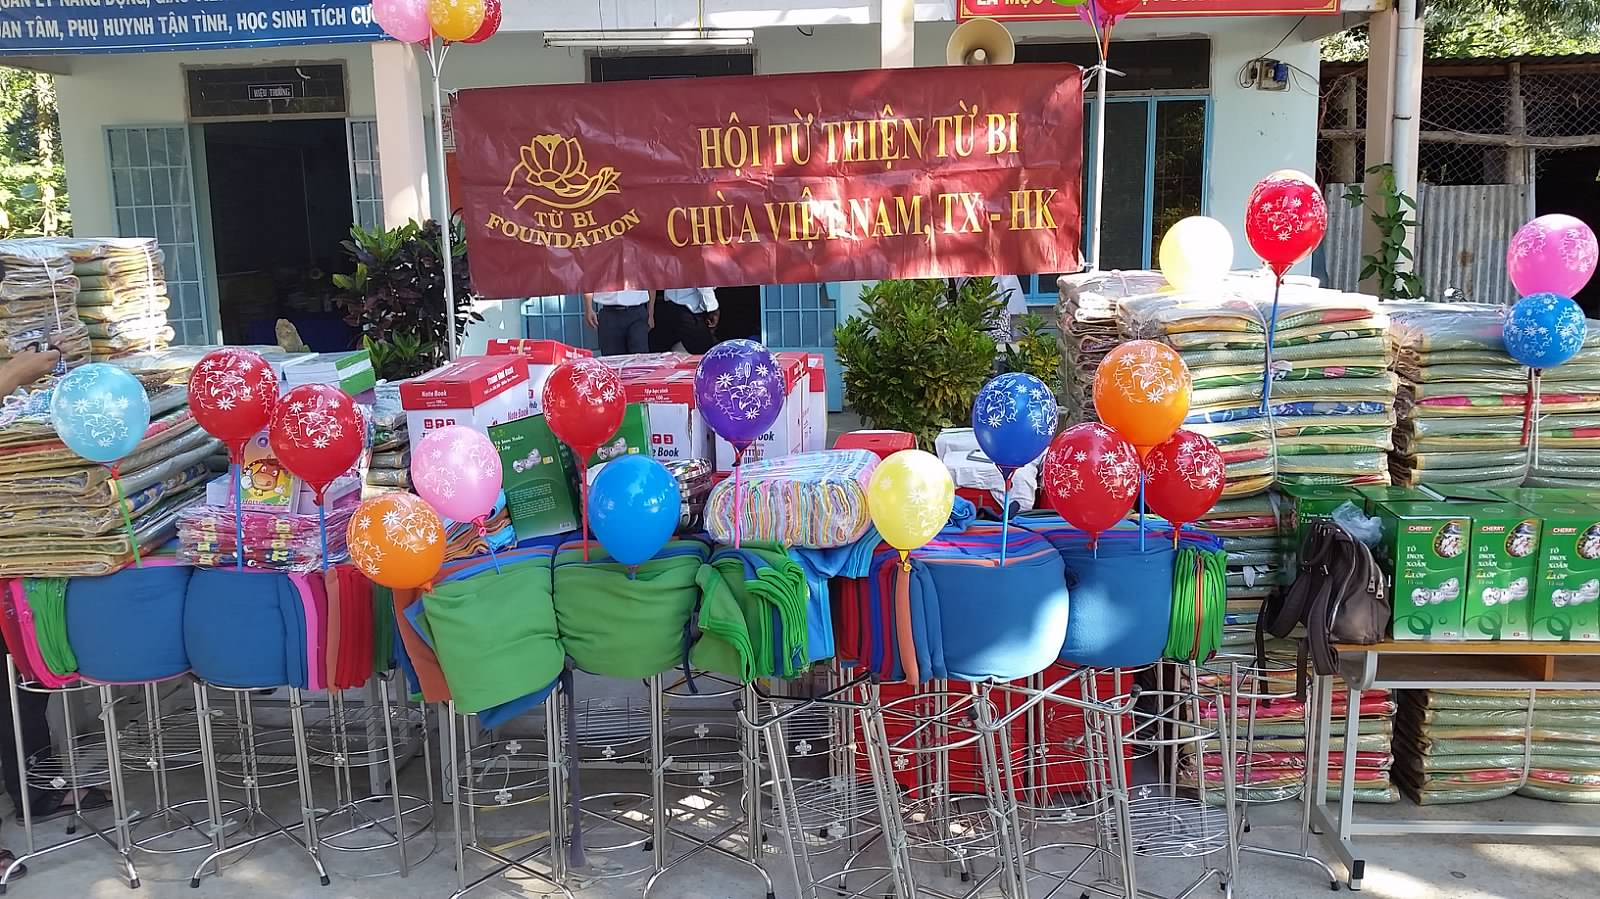 TQ Tieu Hoc Khanh Thuong 10